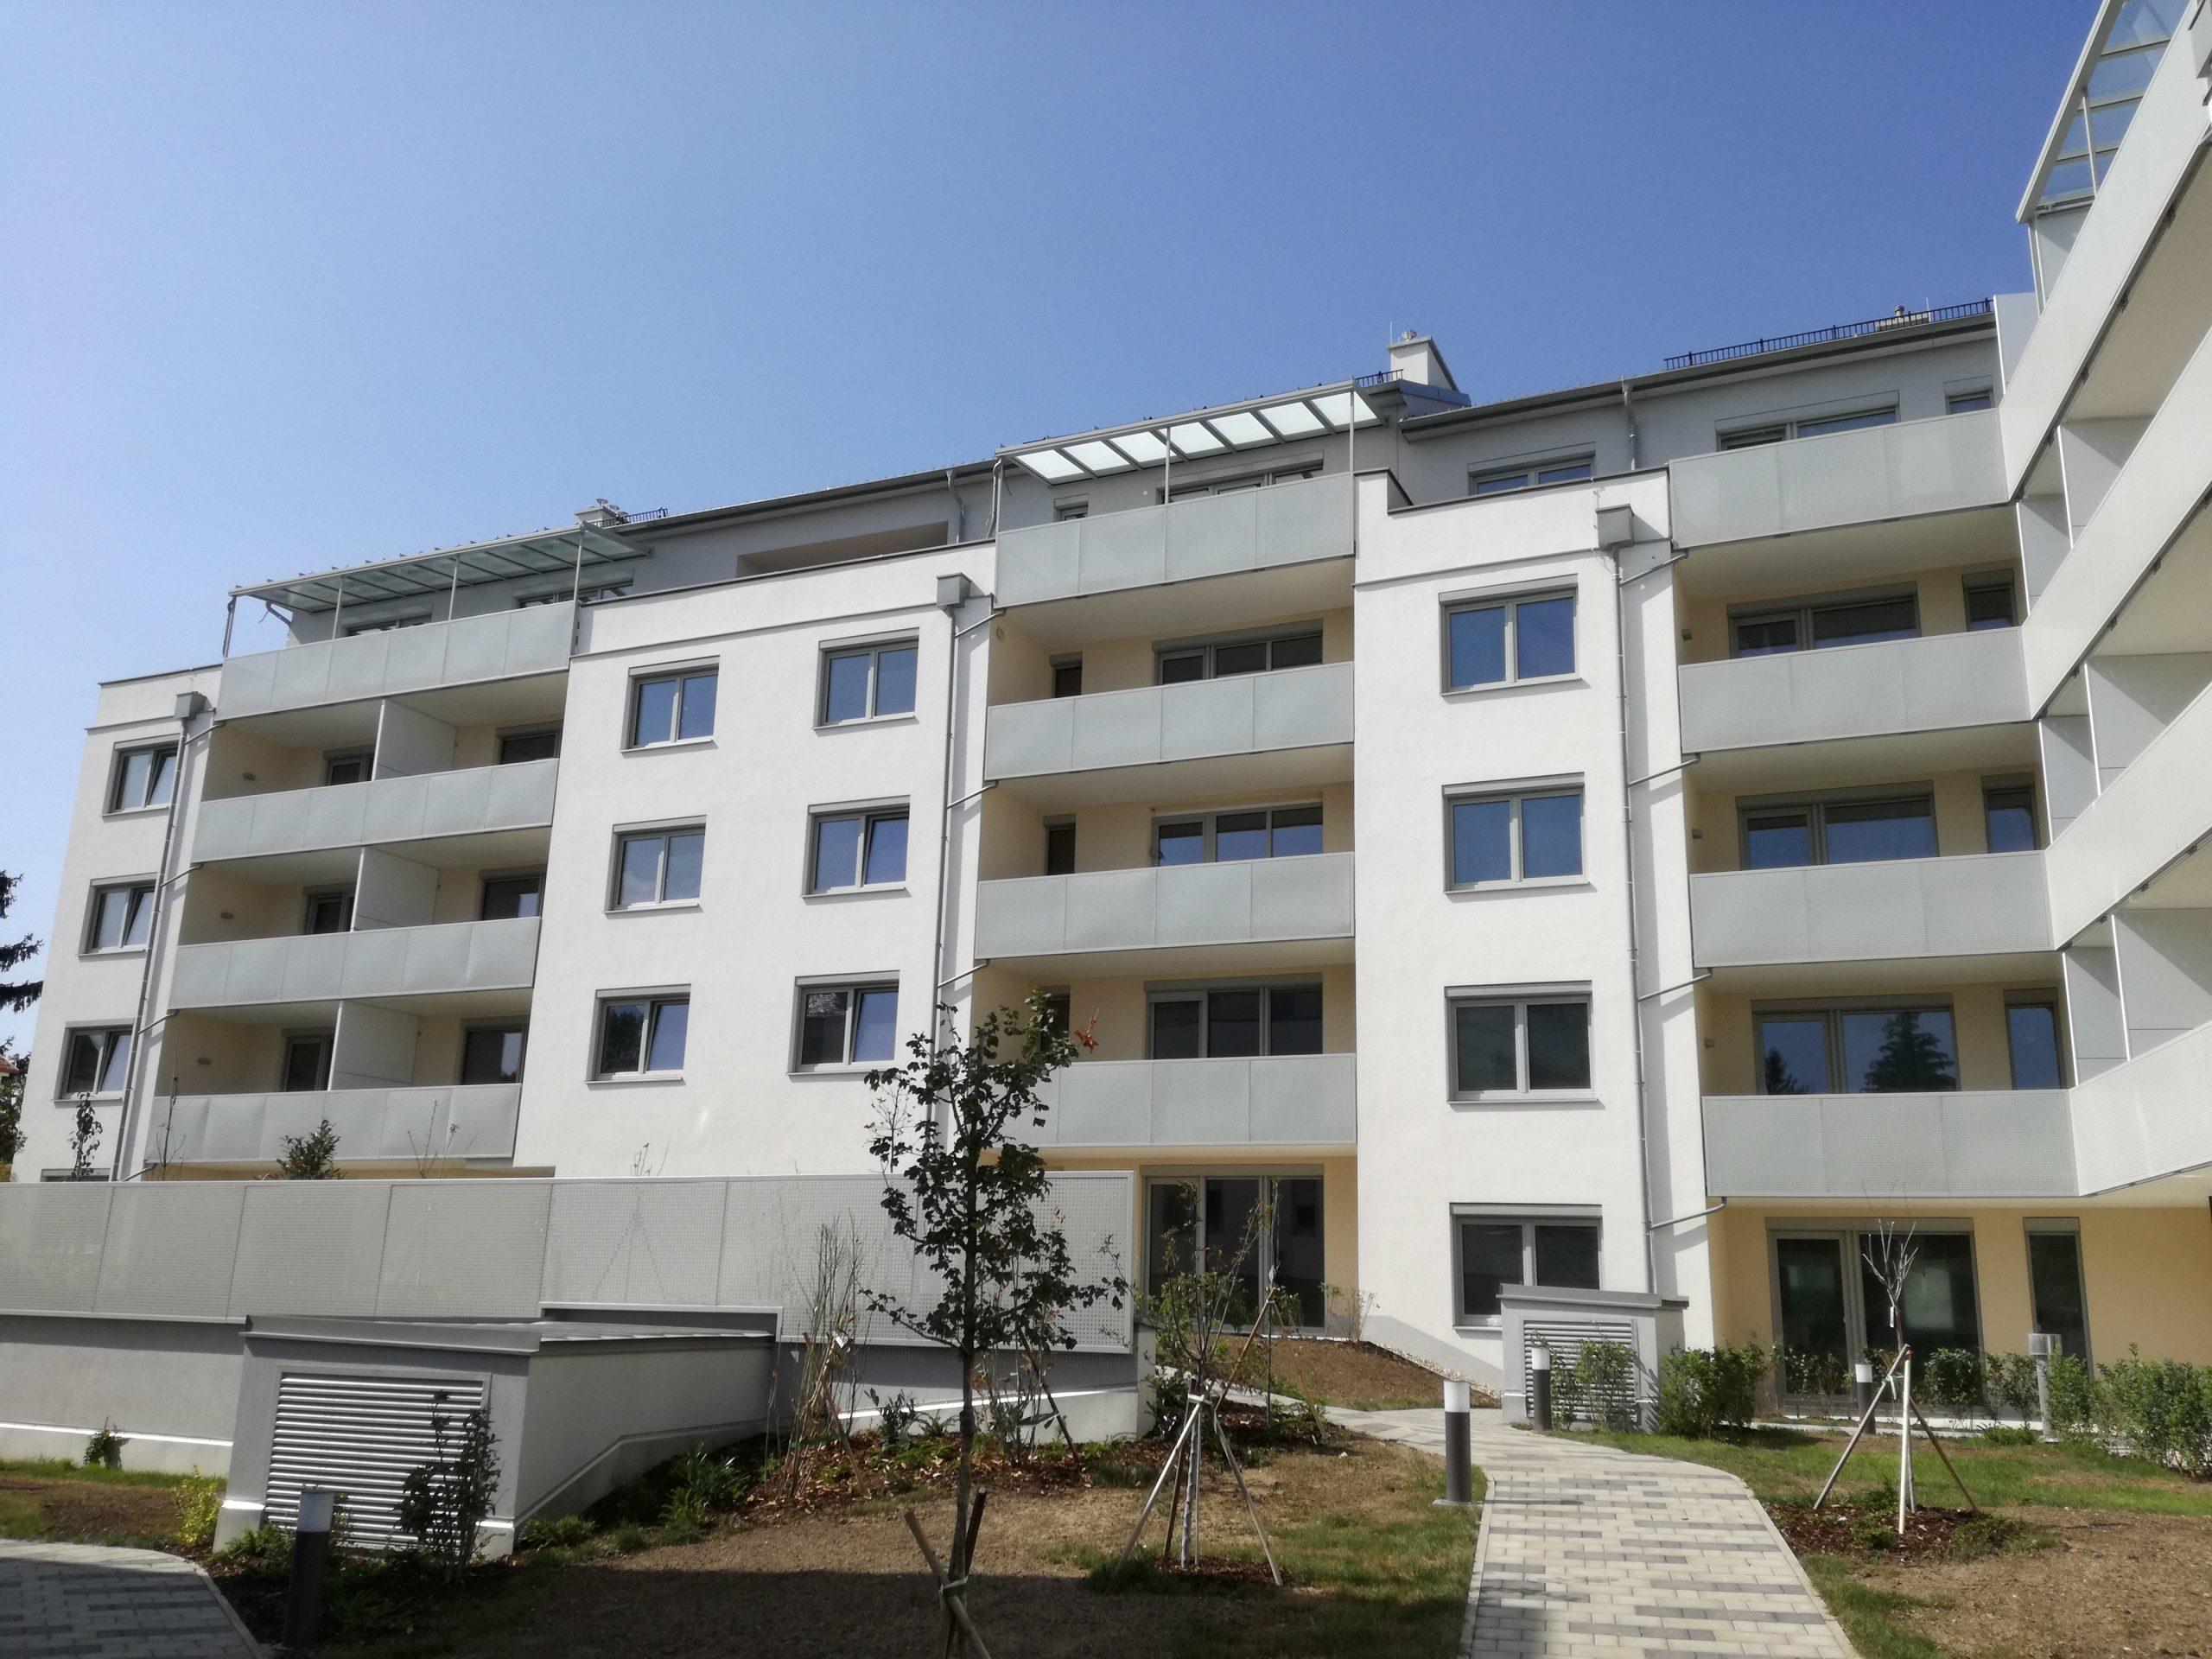 Immobilie von Kamptal in 2130 Mistelbach, Mistelbach, Mistelbach X/1 & X/2 - Top 205 #2